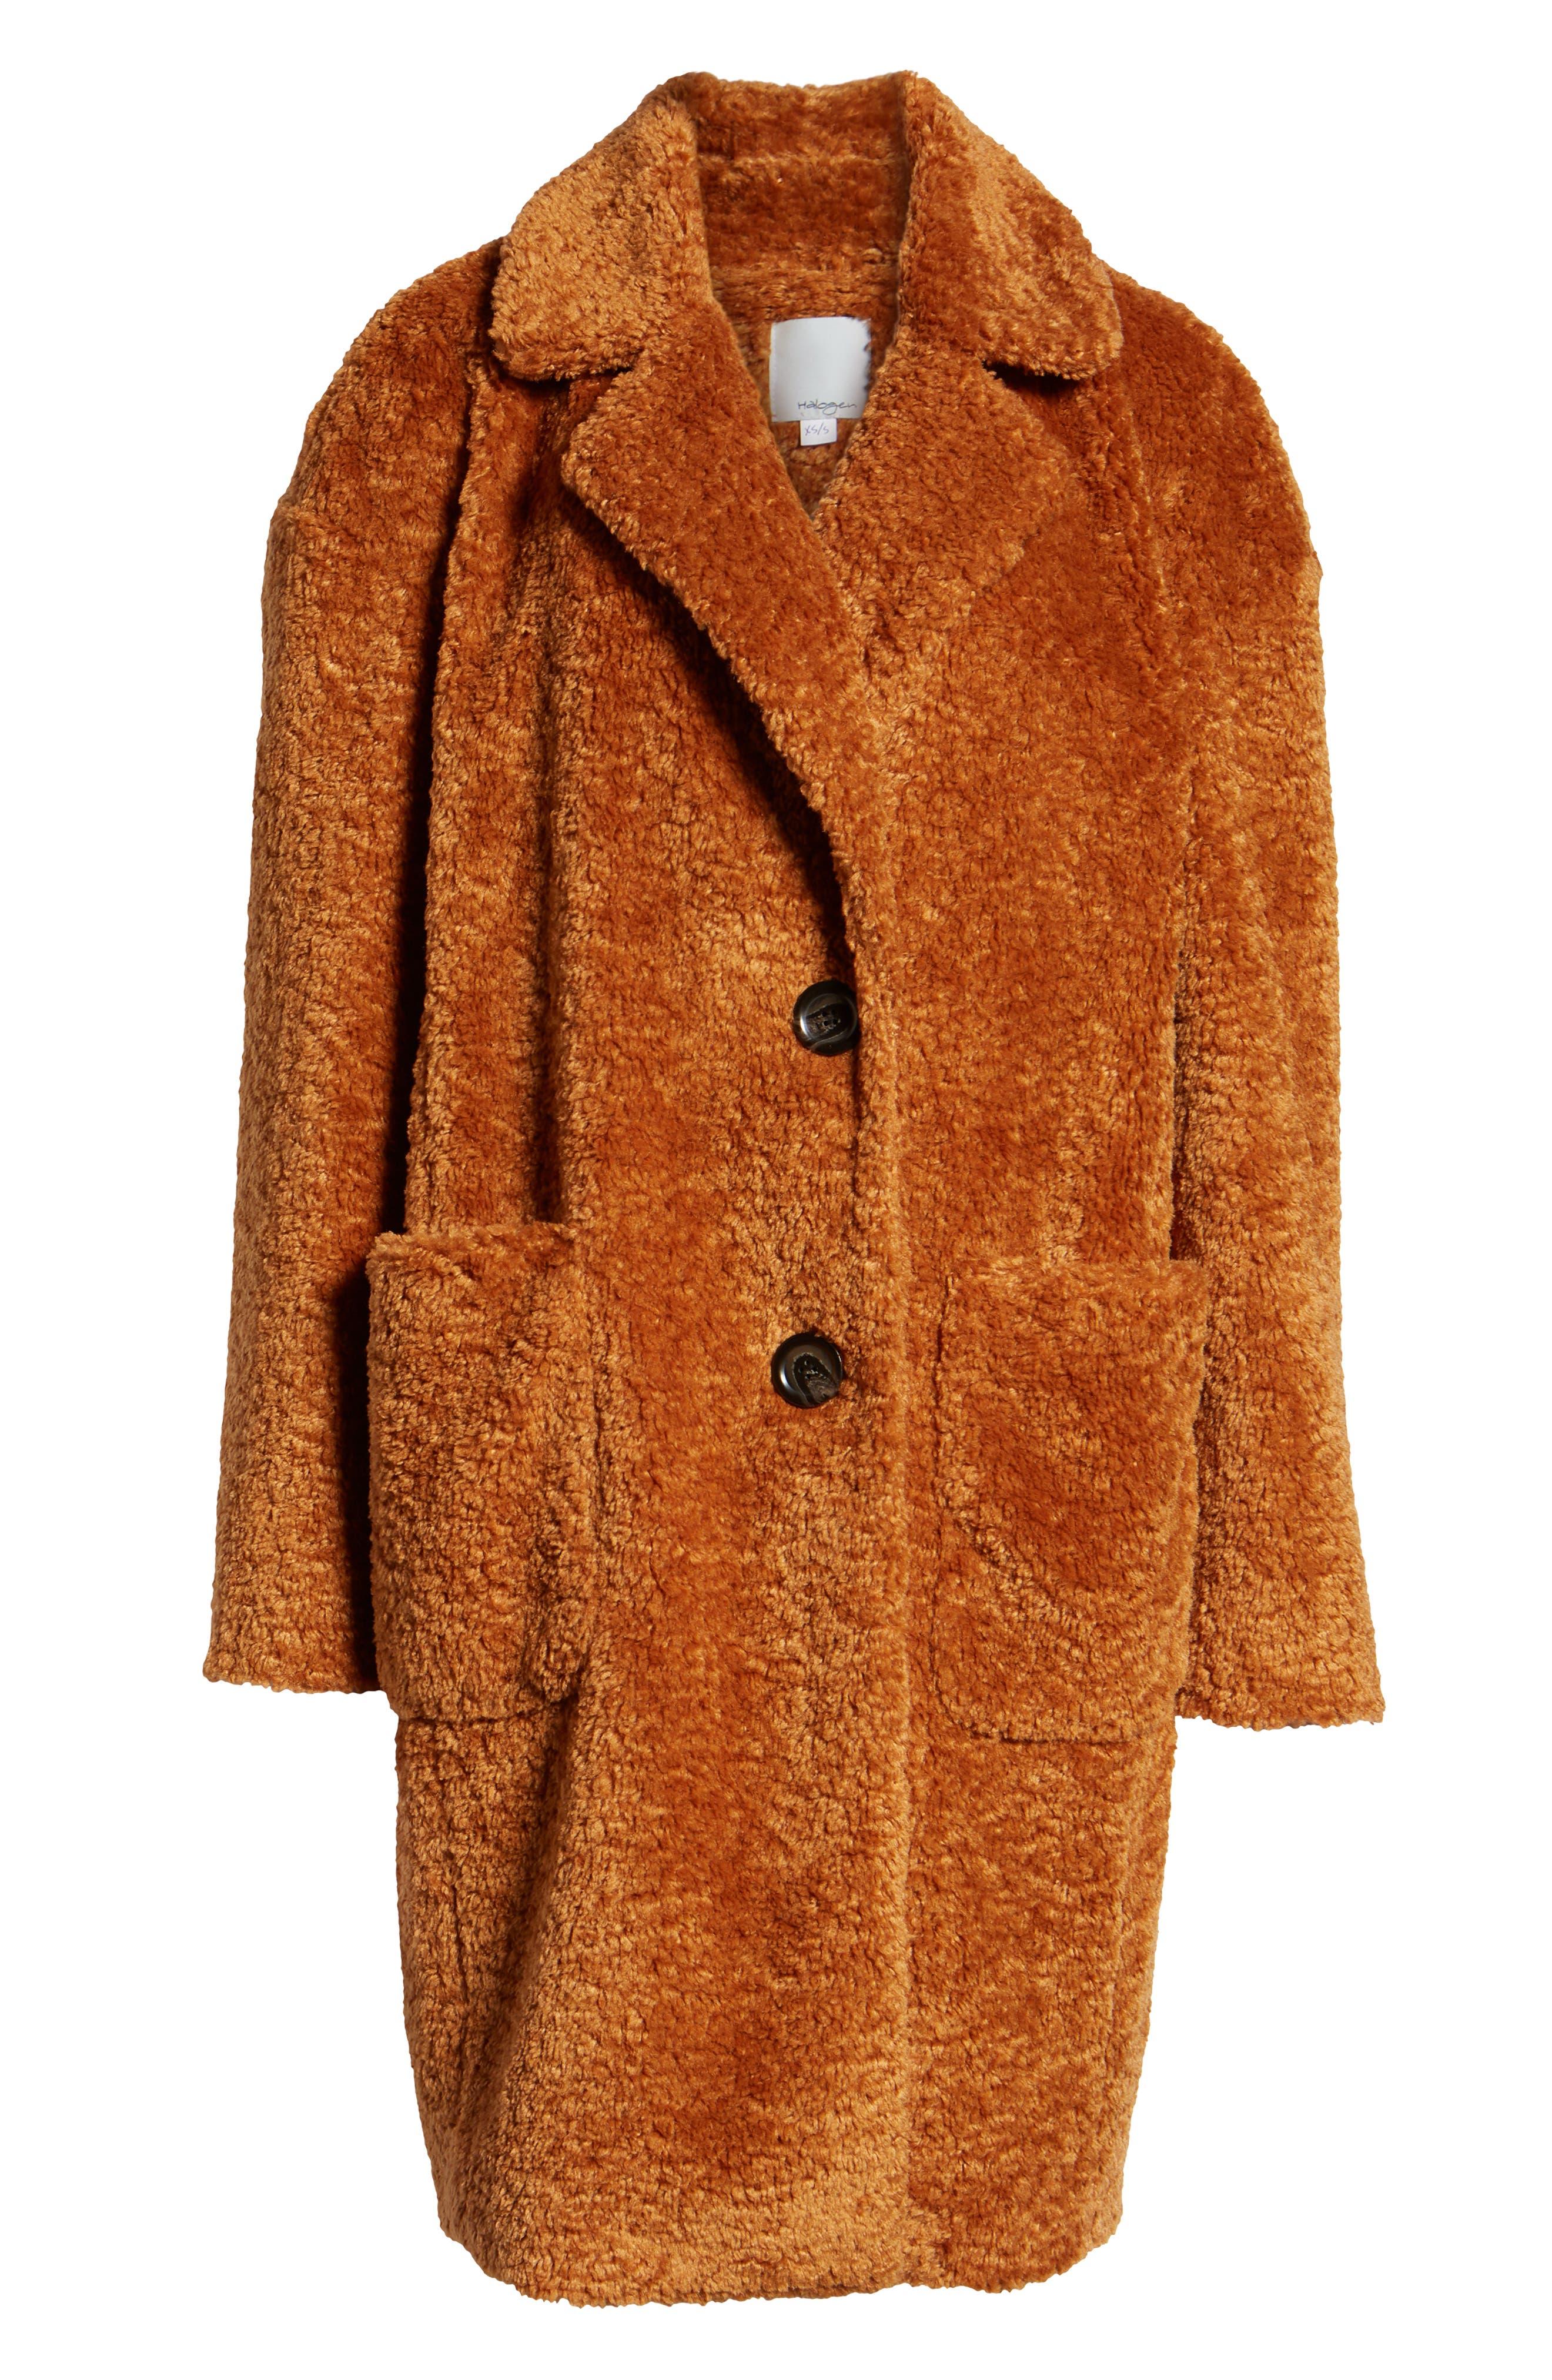 x Atlantic-Pacific Faux Fur Coat,                             Alternate thumbnail 6, color,                             RUST GINGER